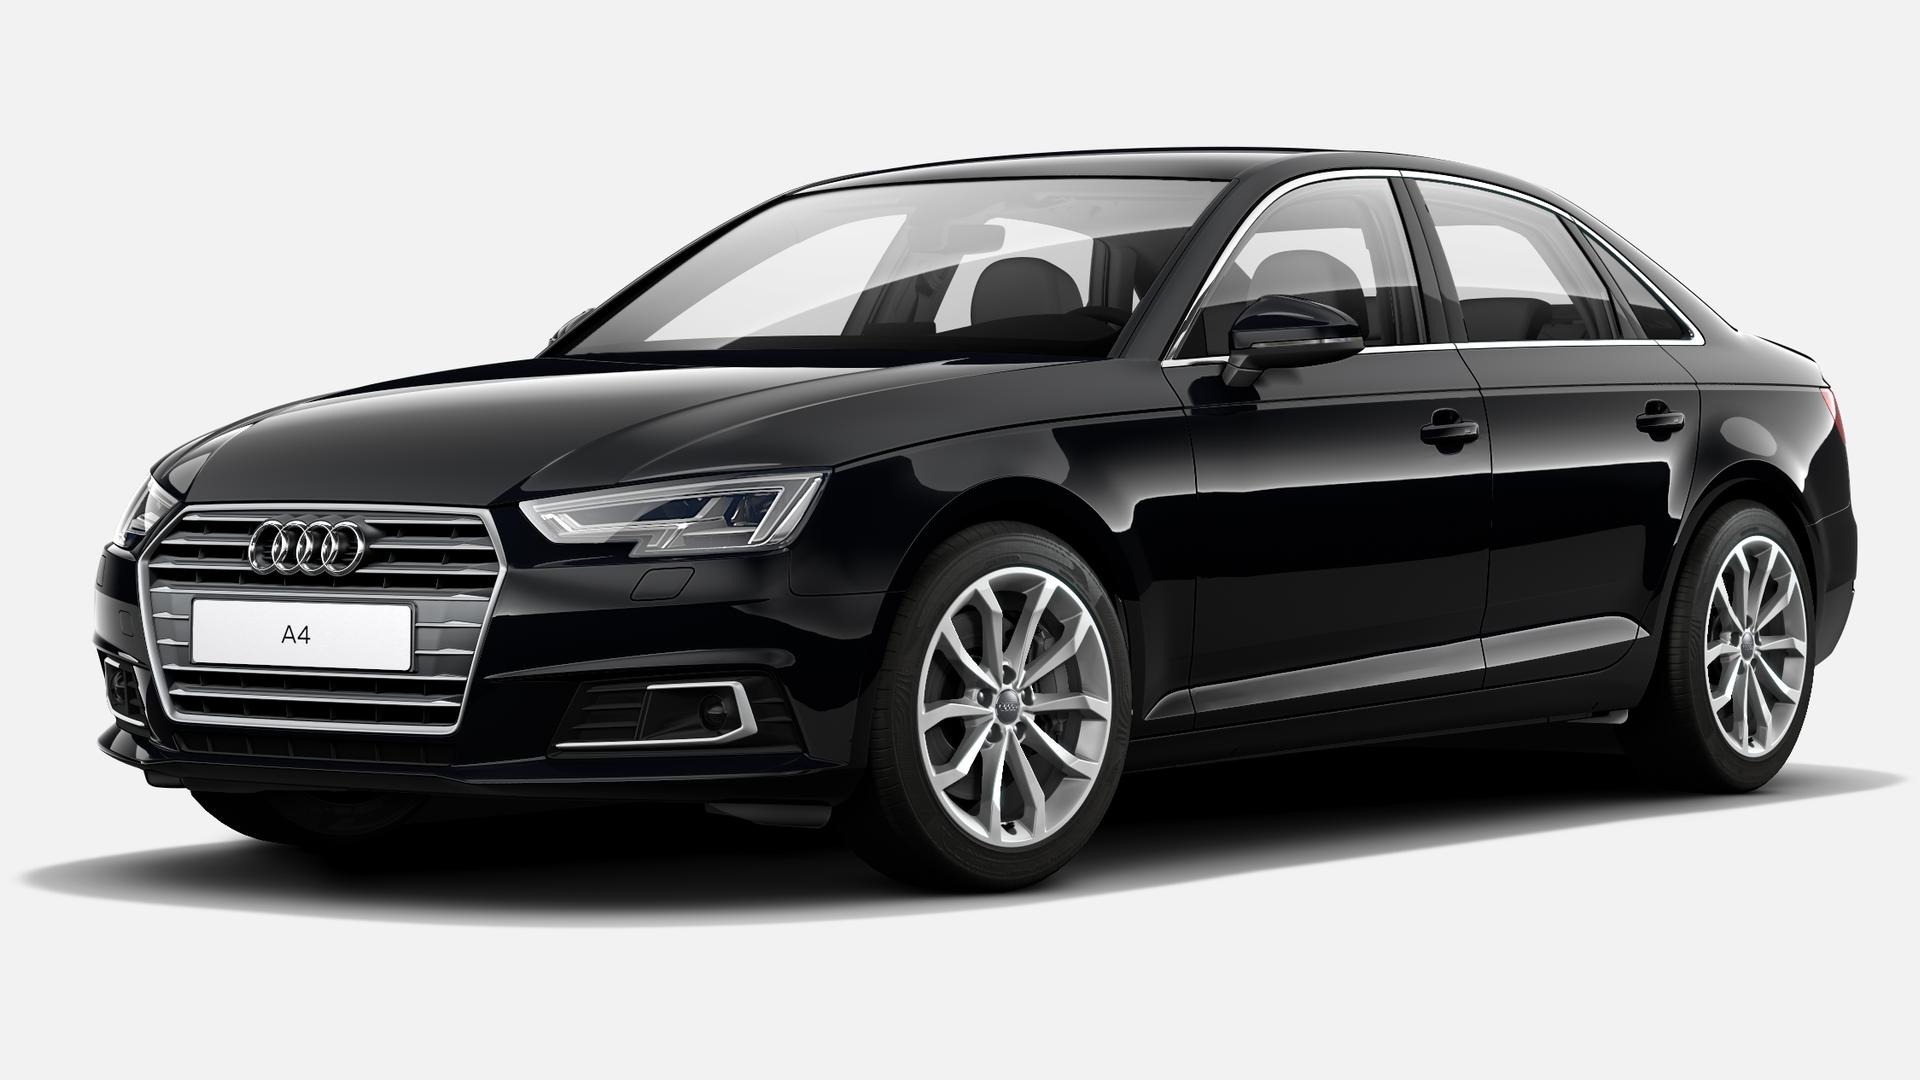 Foto 1 Audi A4 2.0 TDI S Line Edition S Tronic 140 kW (190 CV)